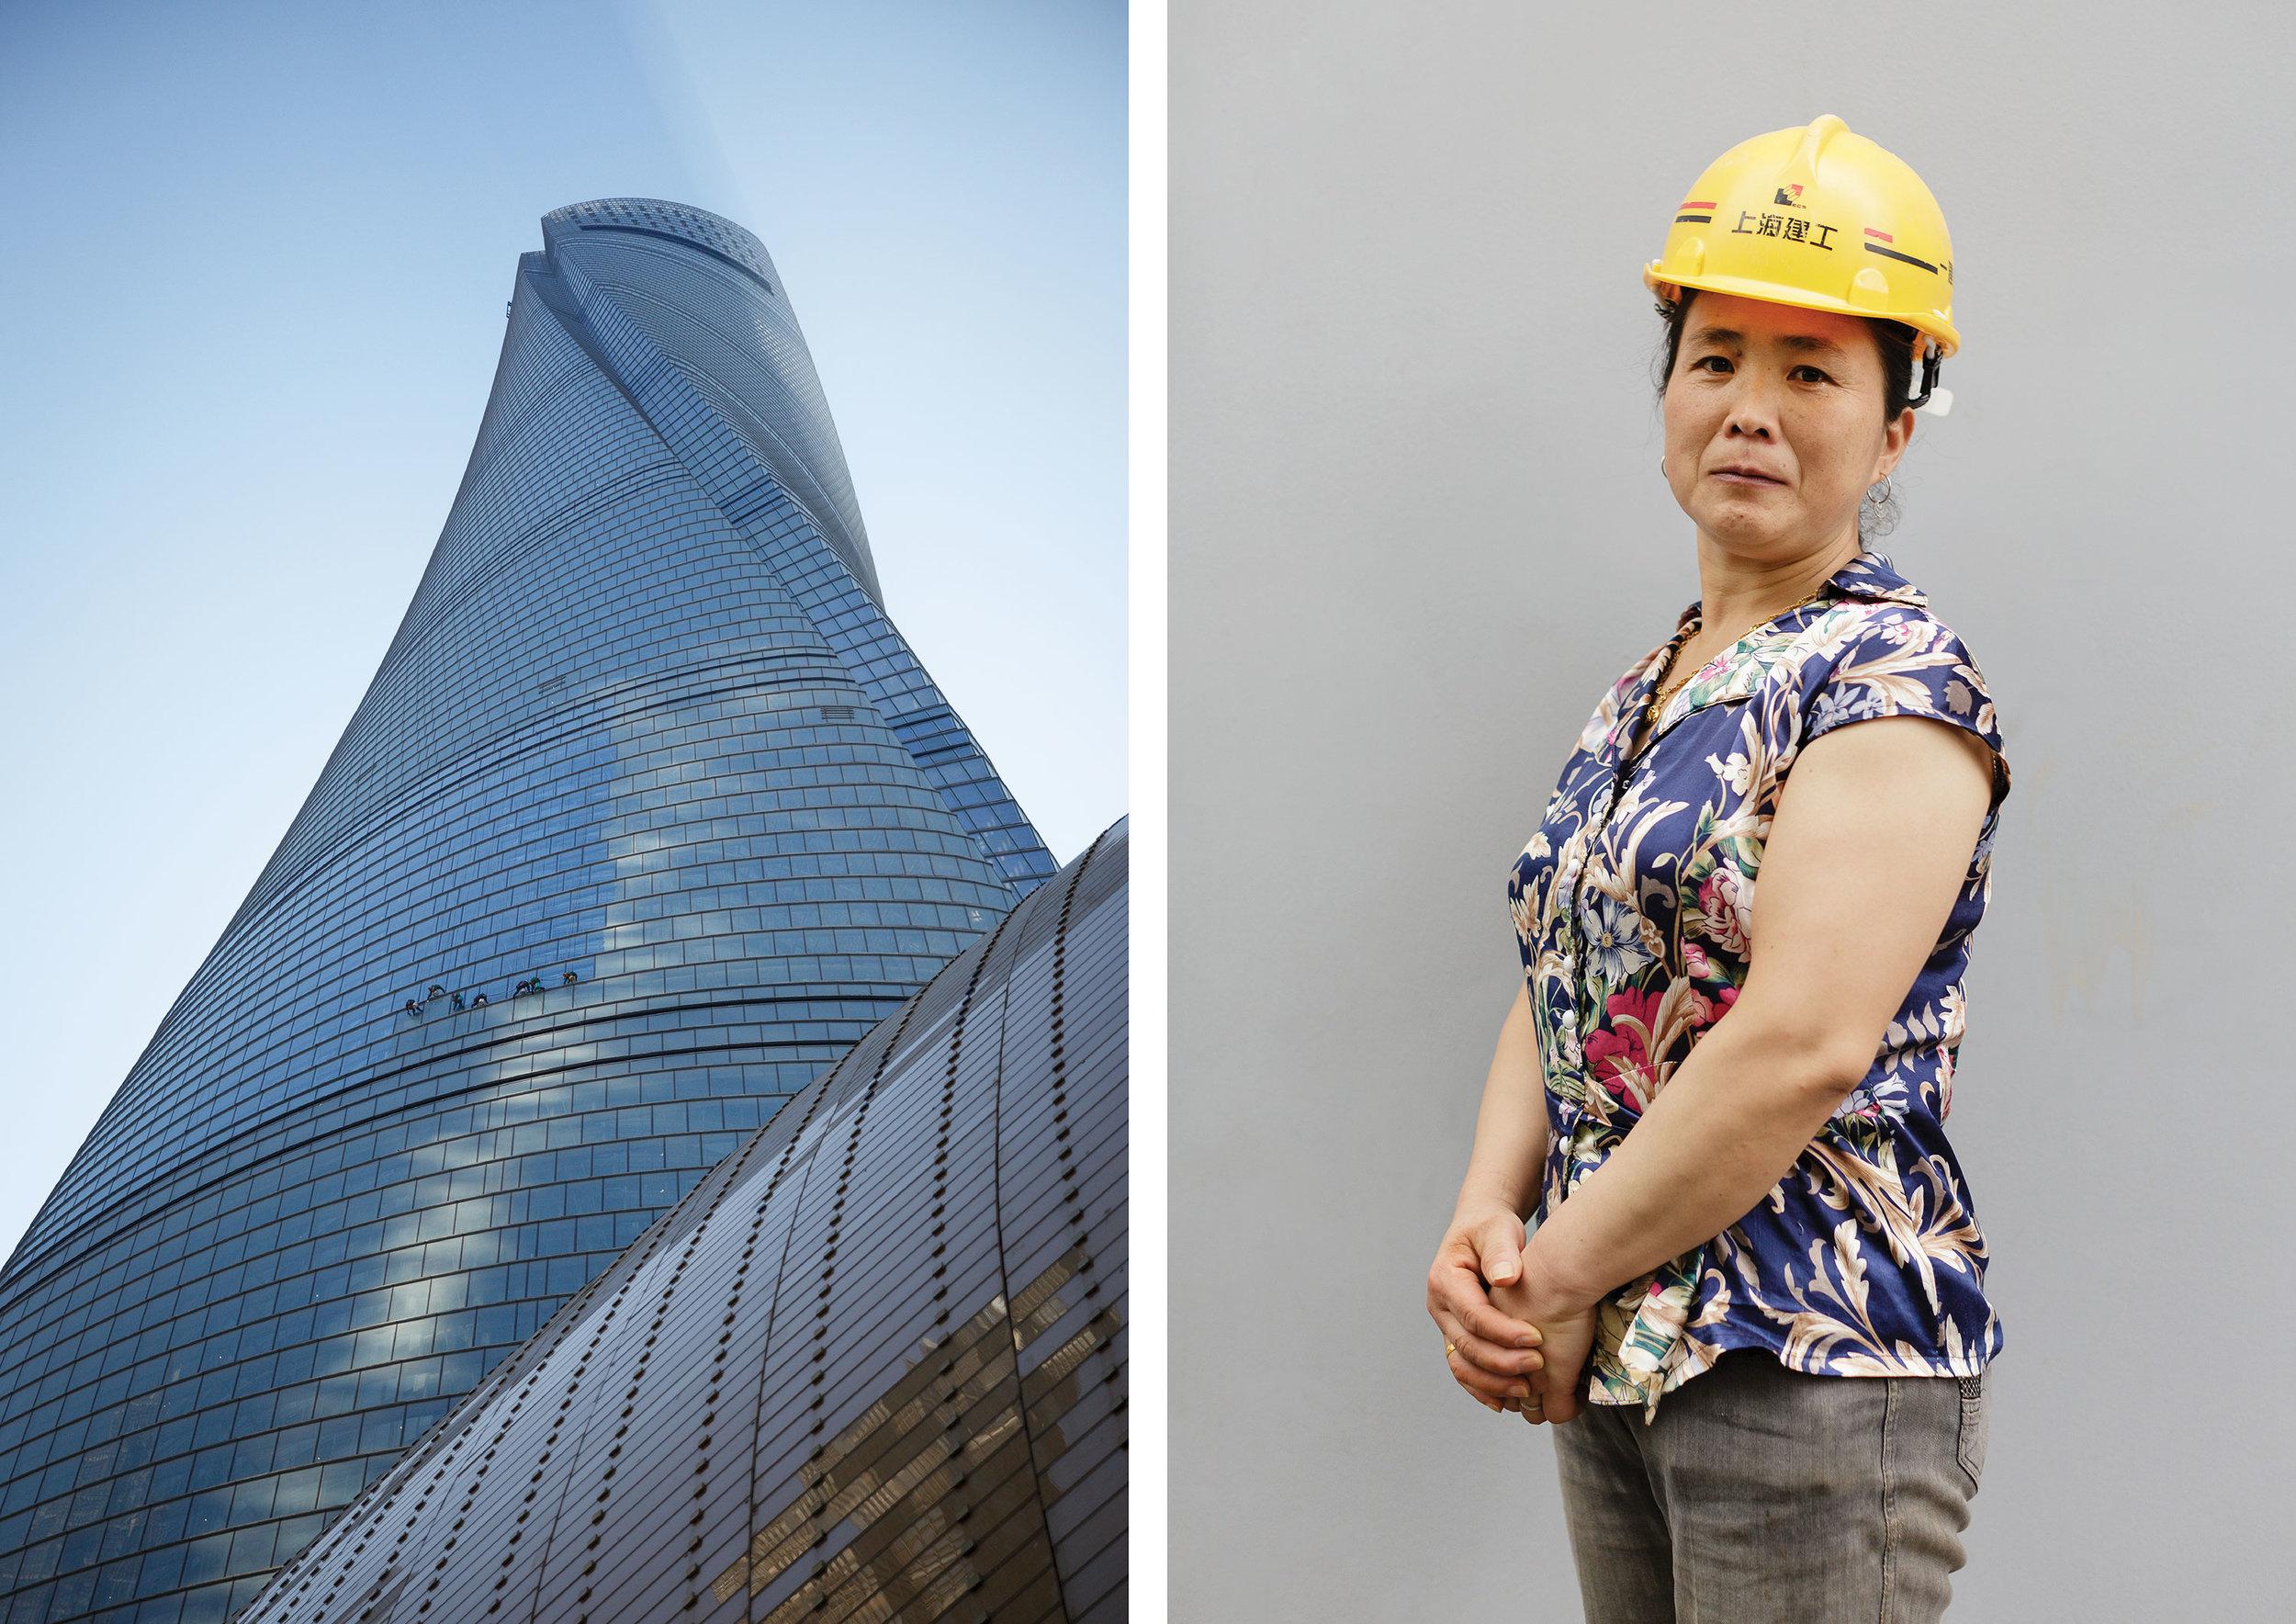 Shanghai_Tower-workers-and-building20.jpg